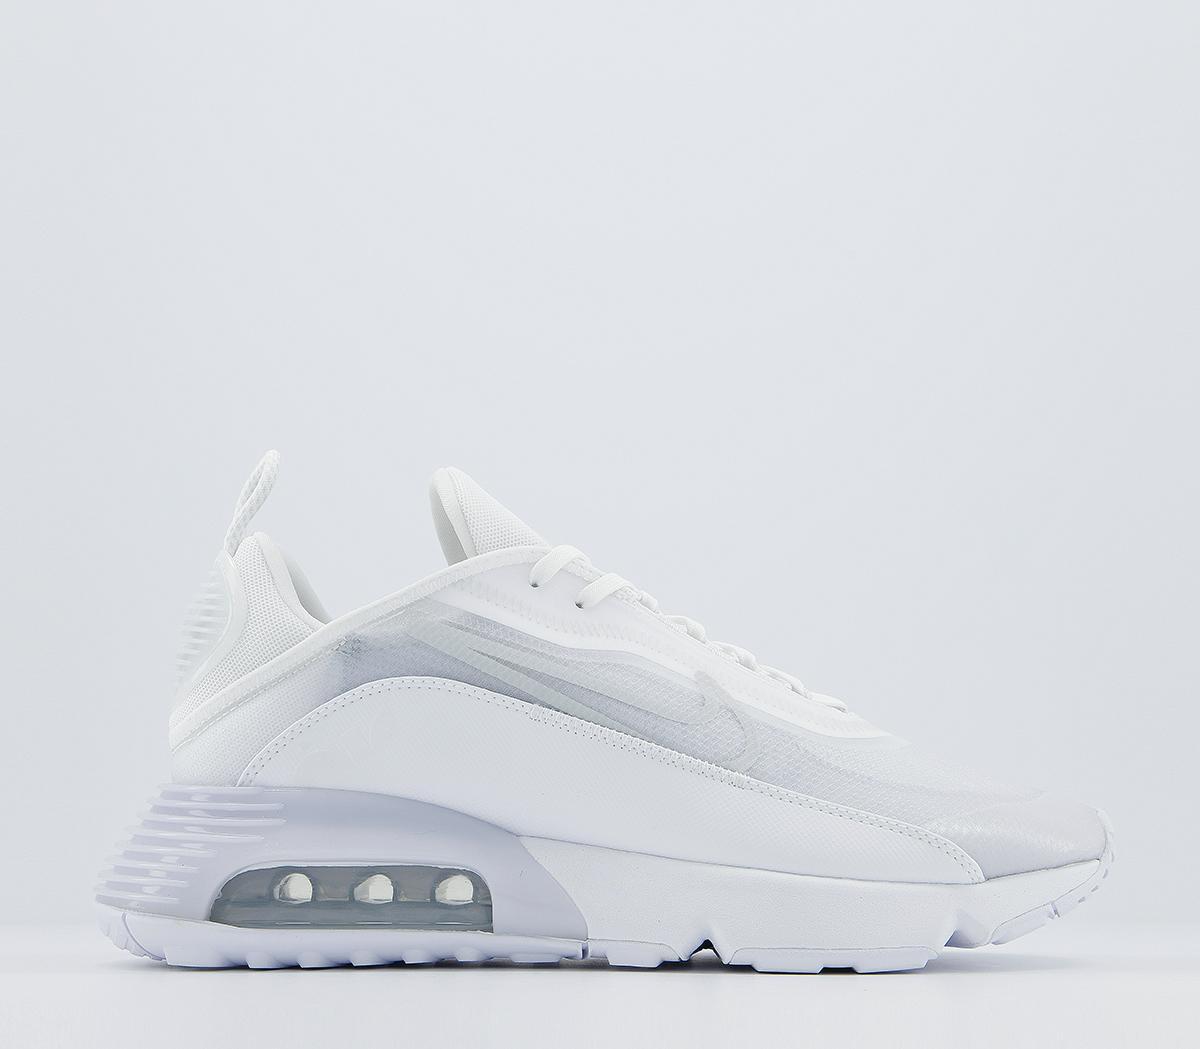 Nike Air Max 2090 Trainers White White